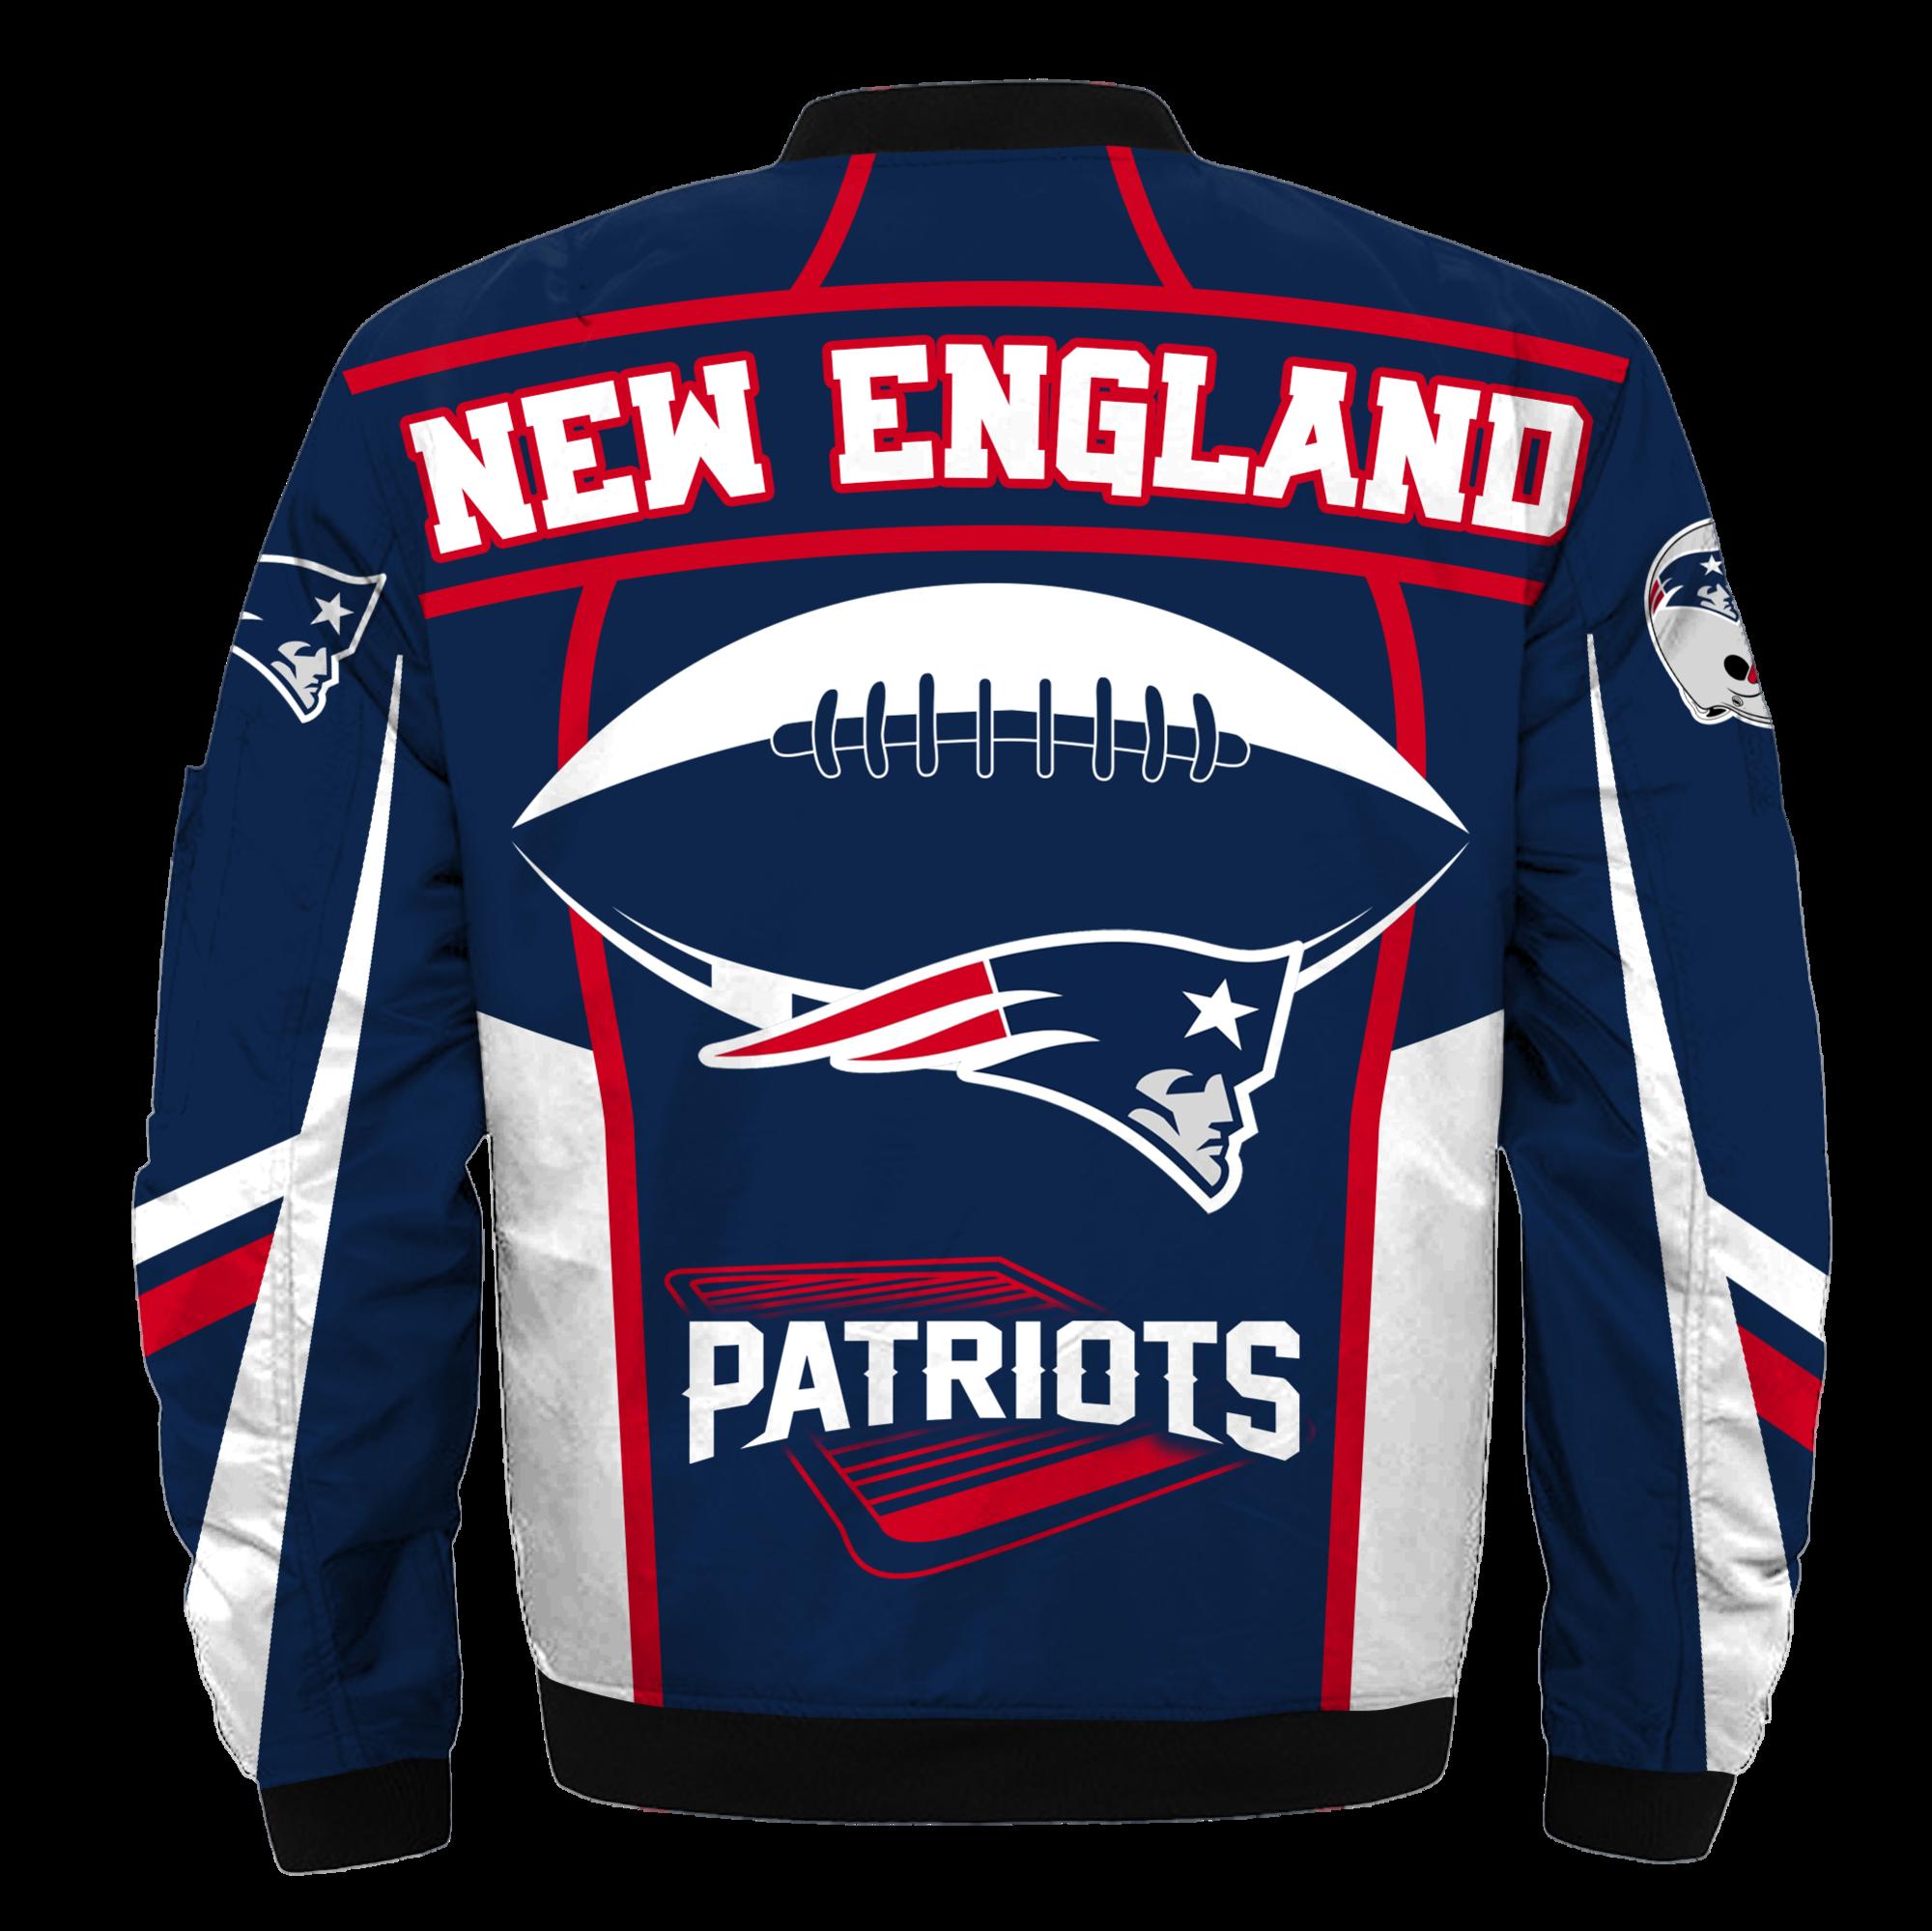 New England Patriots Bomber Jacket Nfl New England Patriots Apparel New England Patriots Apparel New England Patriots Merchandise New England Patriots